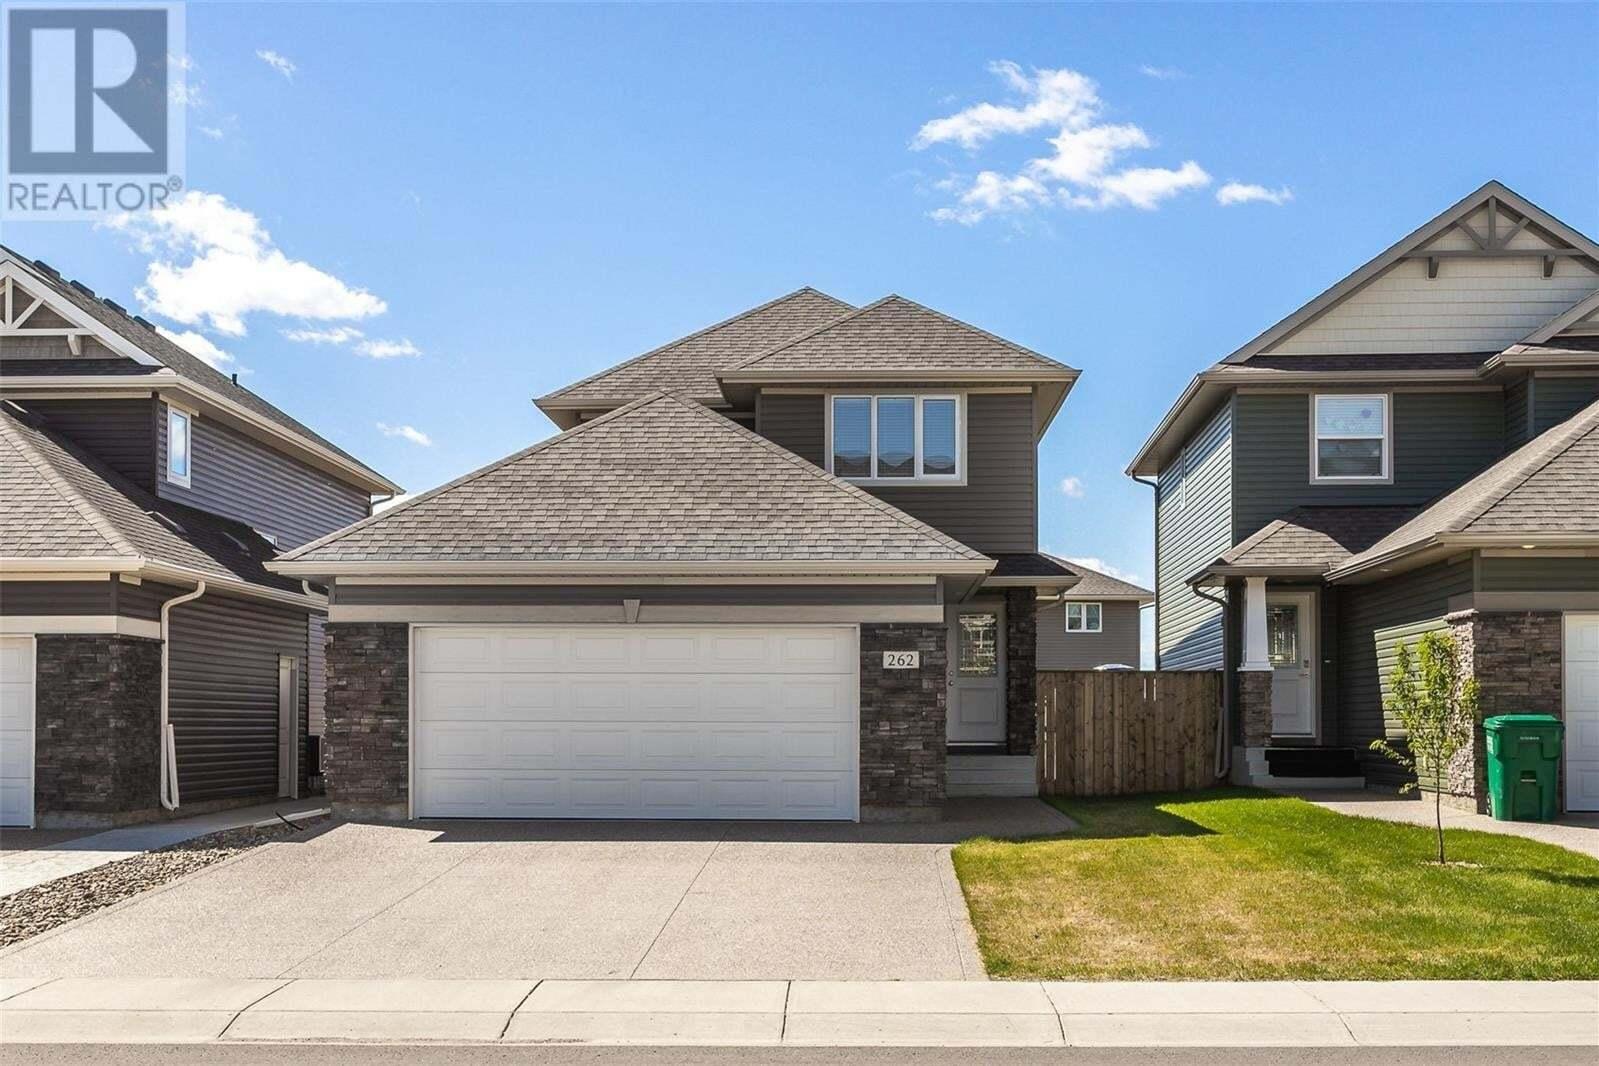 House for sale at 262 Lewin Cres Saskatoon Saskatchewan - MLS: SK809797